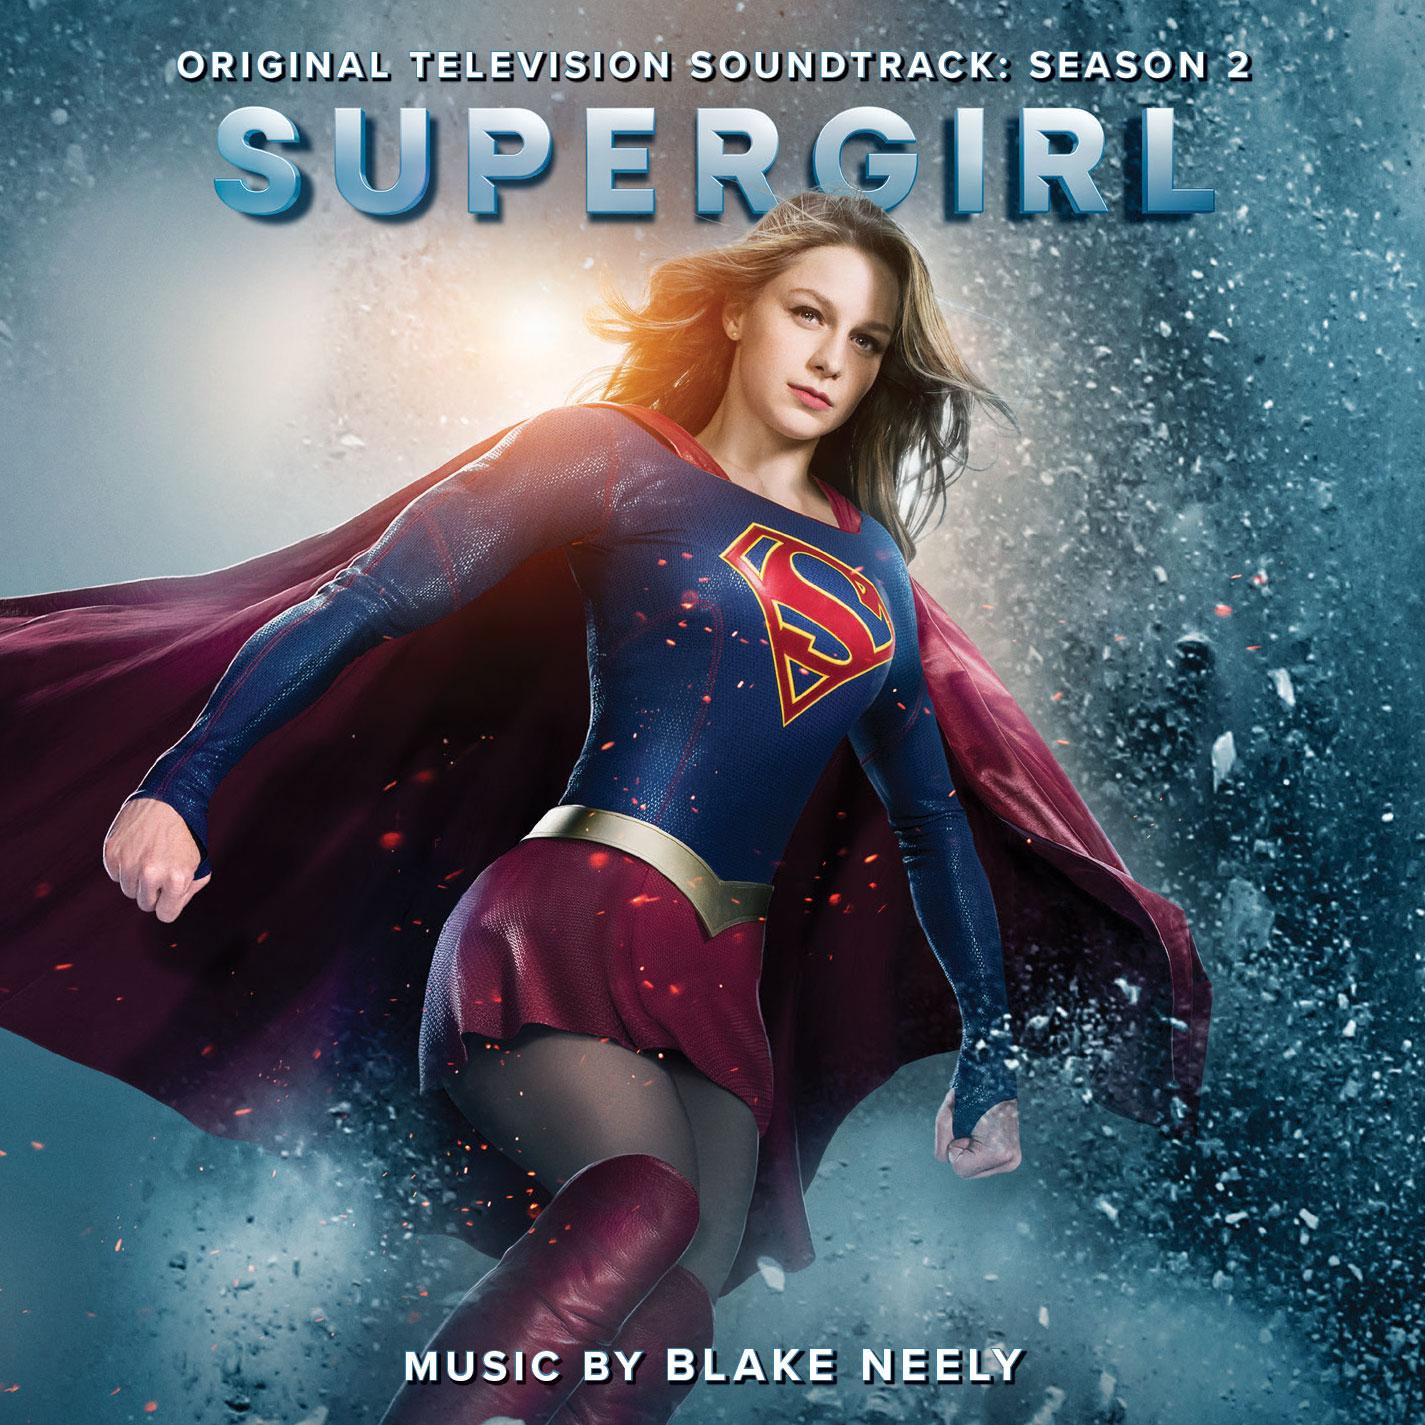 Supergirl: Season 2, Detalles del álbum